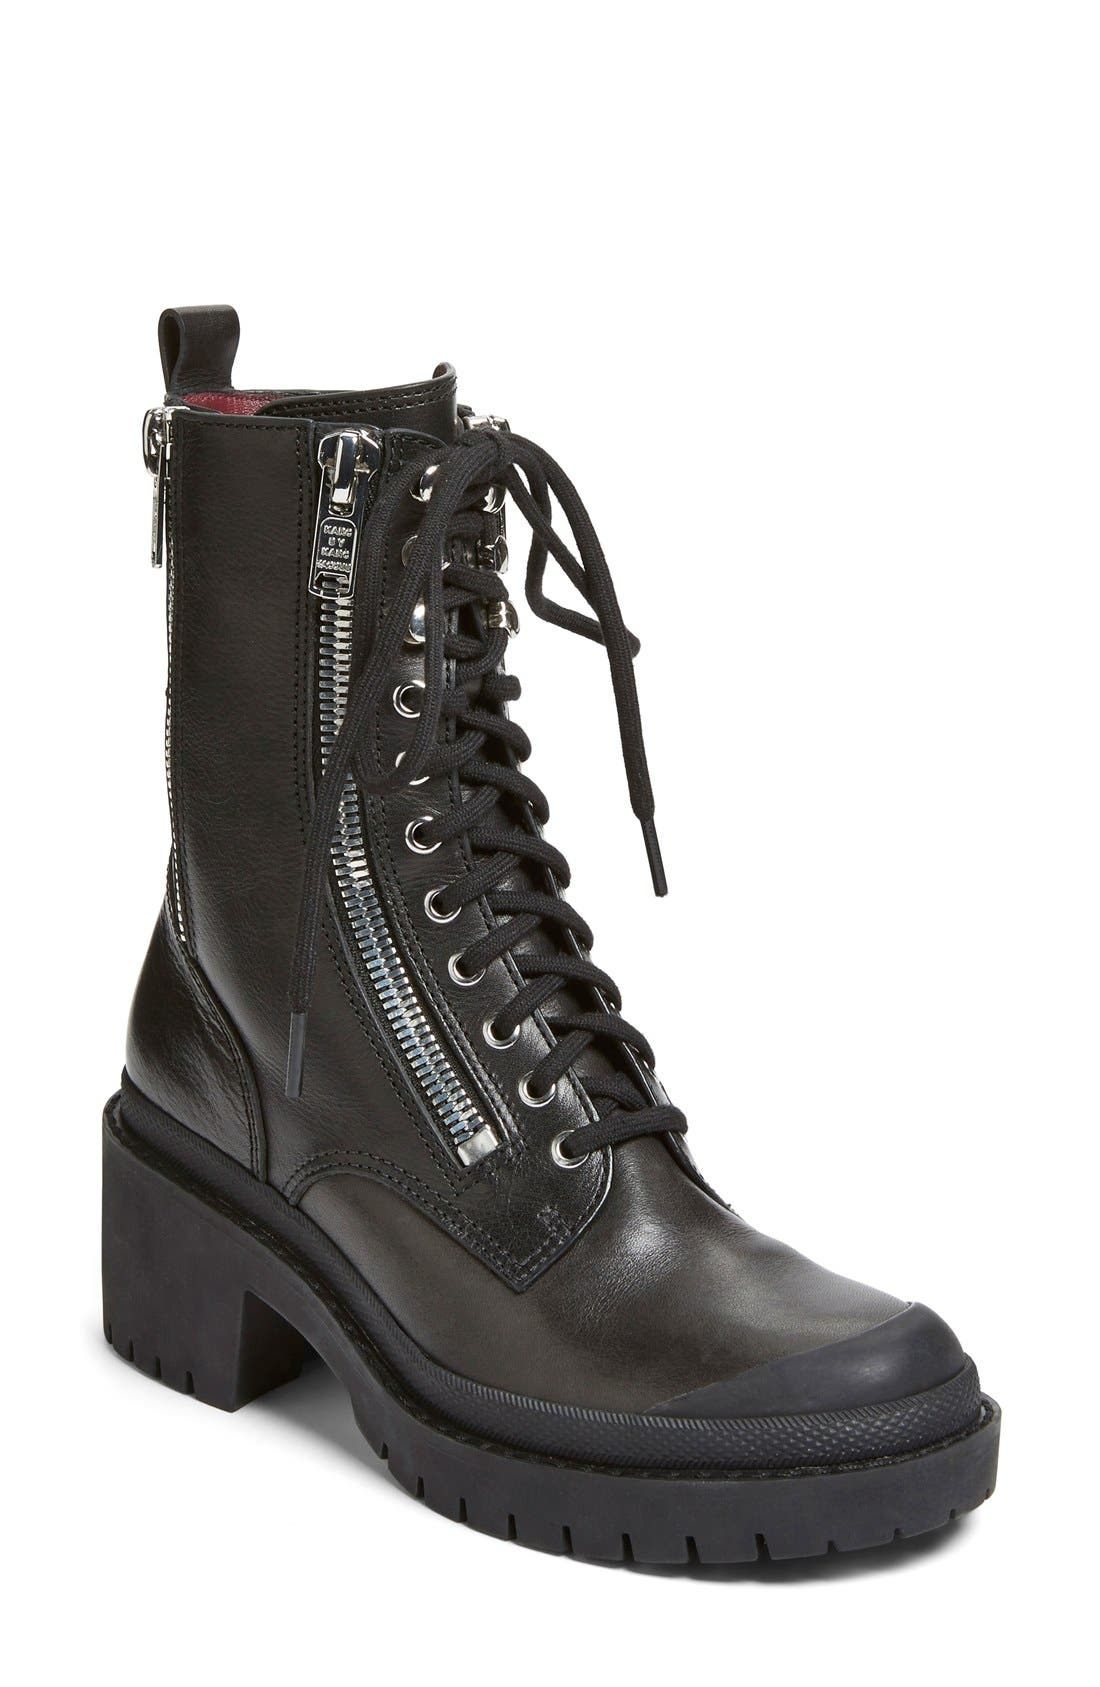 Main Image - MARC BY MARC JACOBS 'Zip It' Multi Zip Boot (Women)